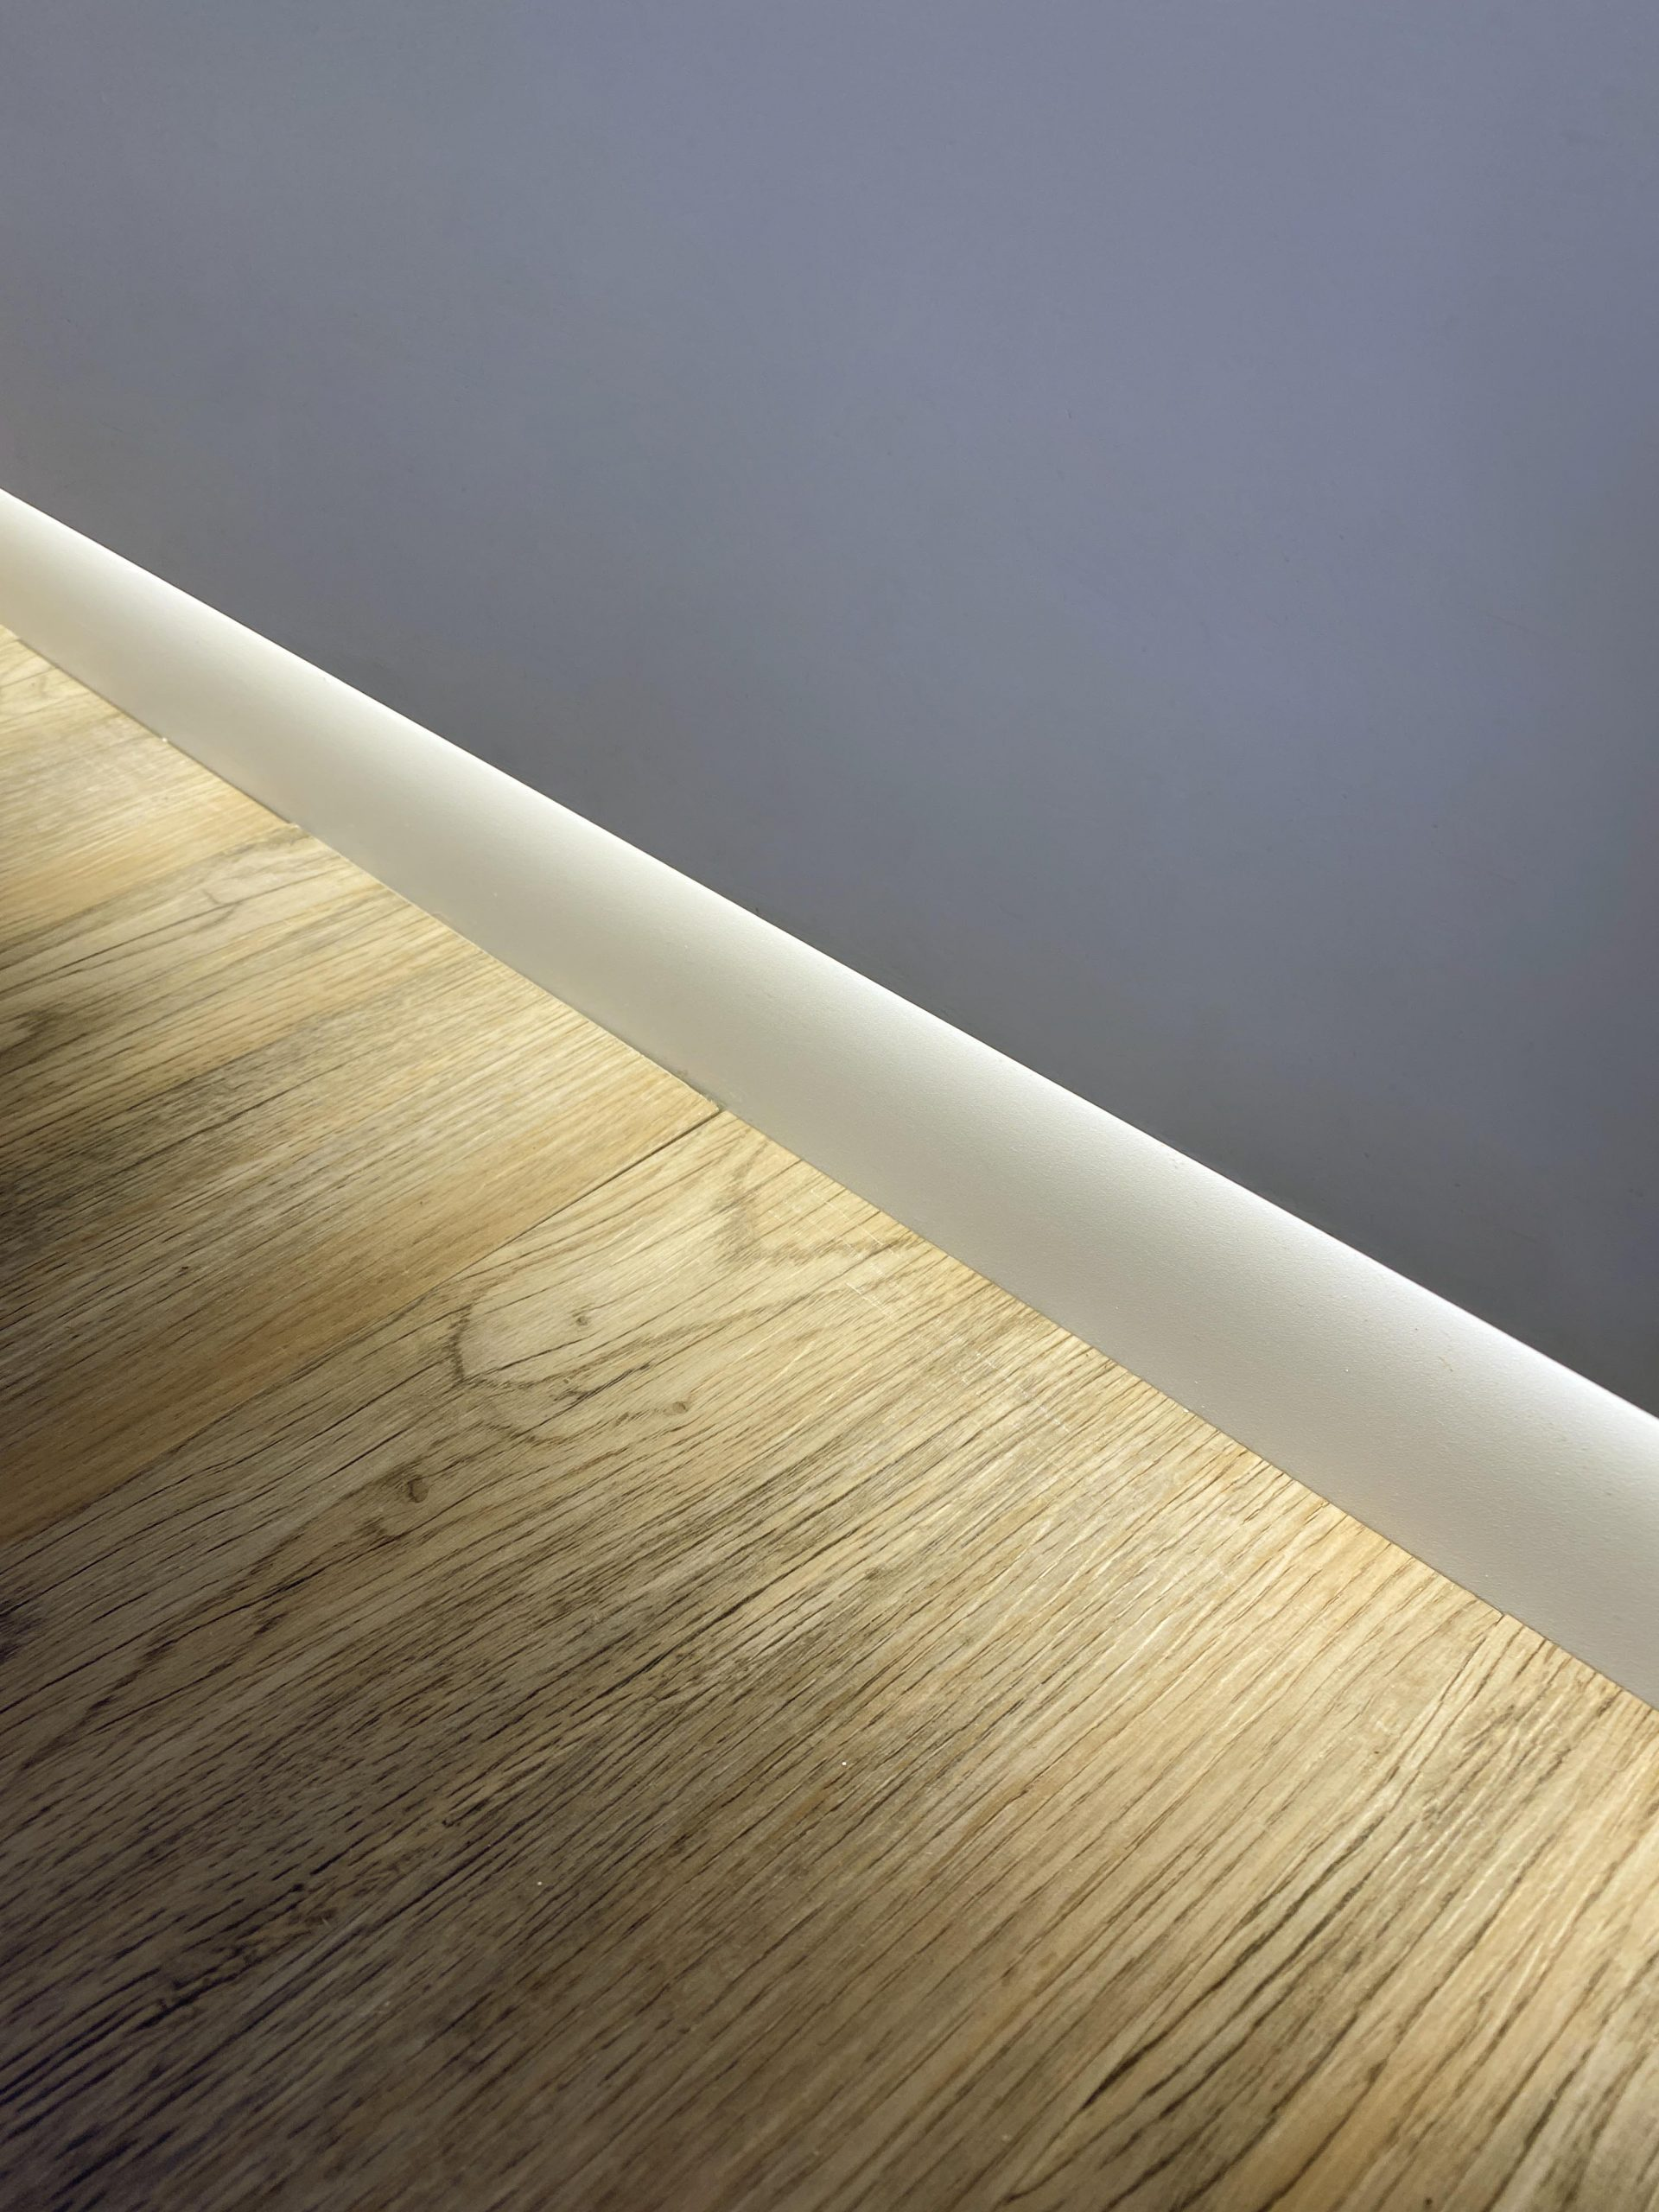 Baseboard channel for LED Strip